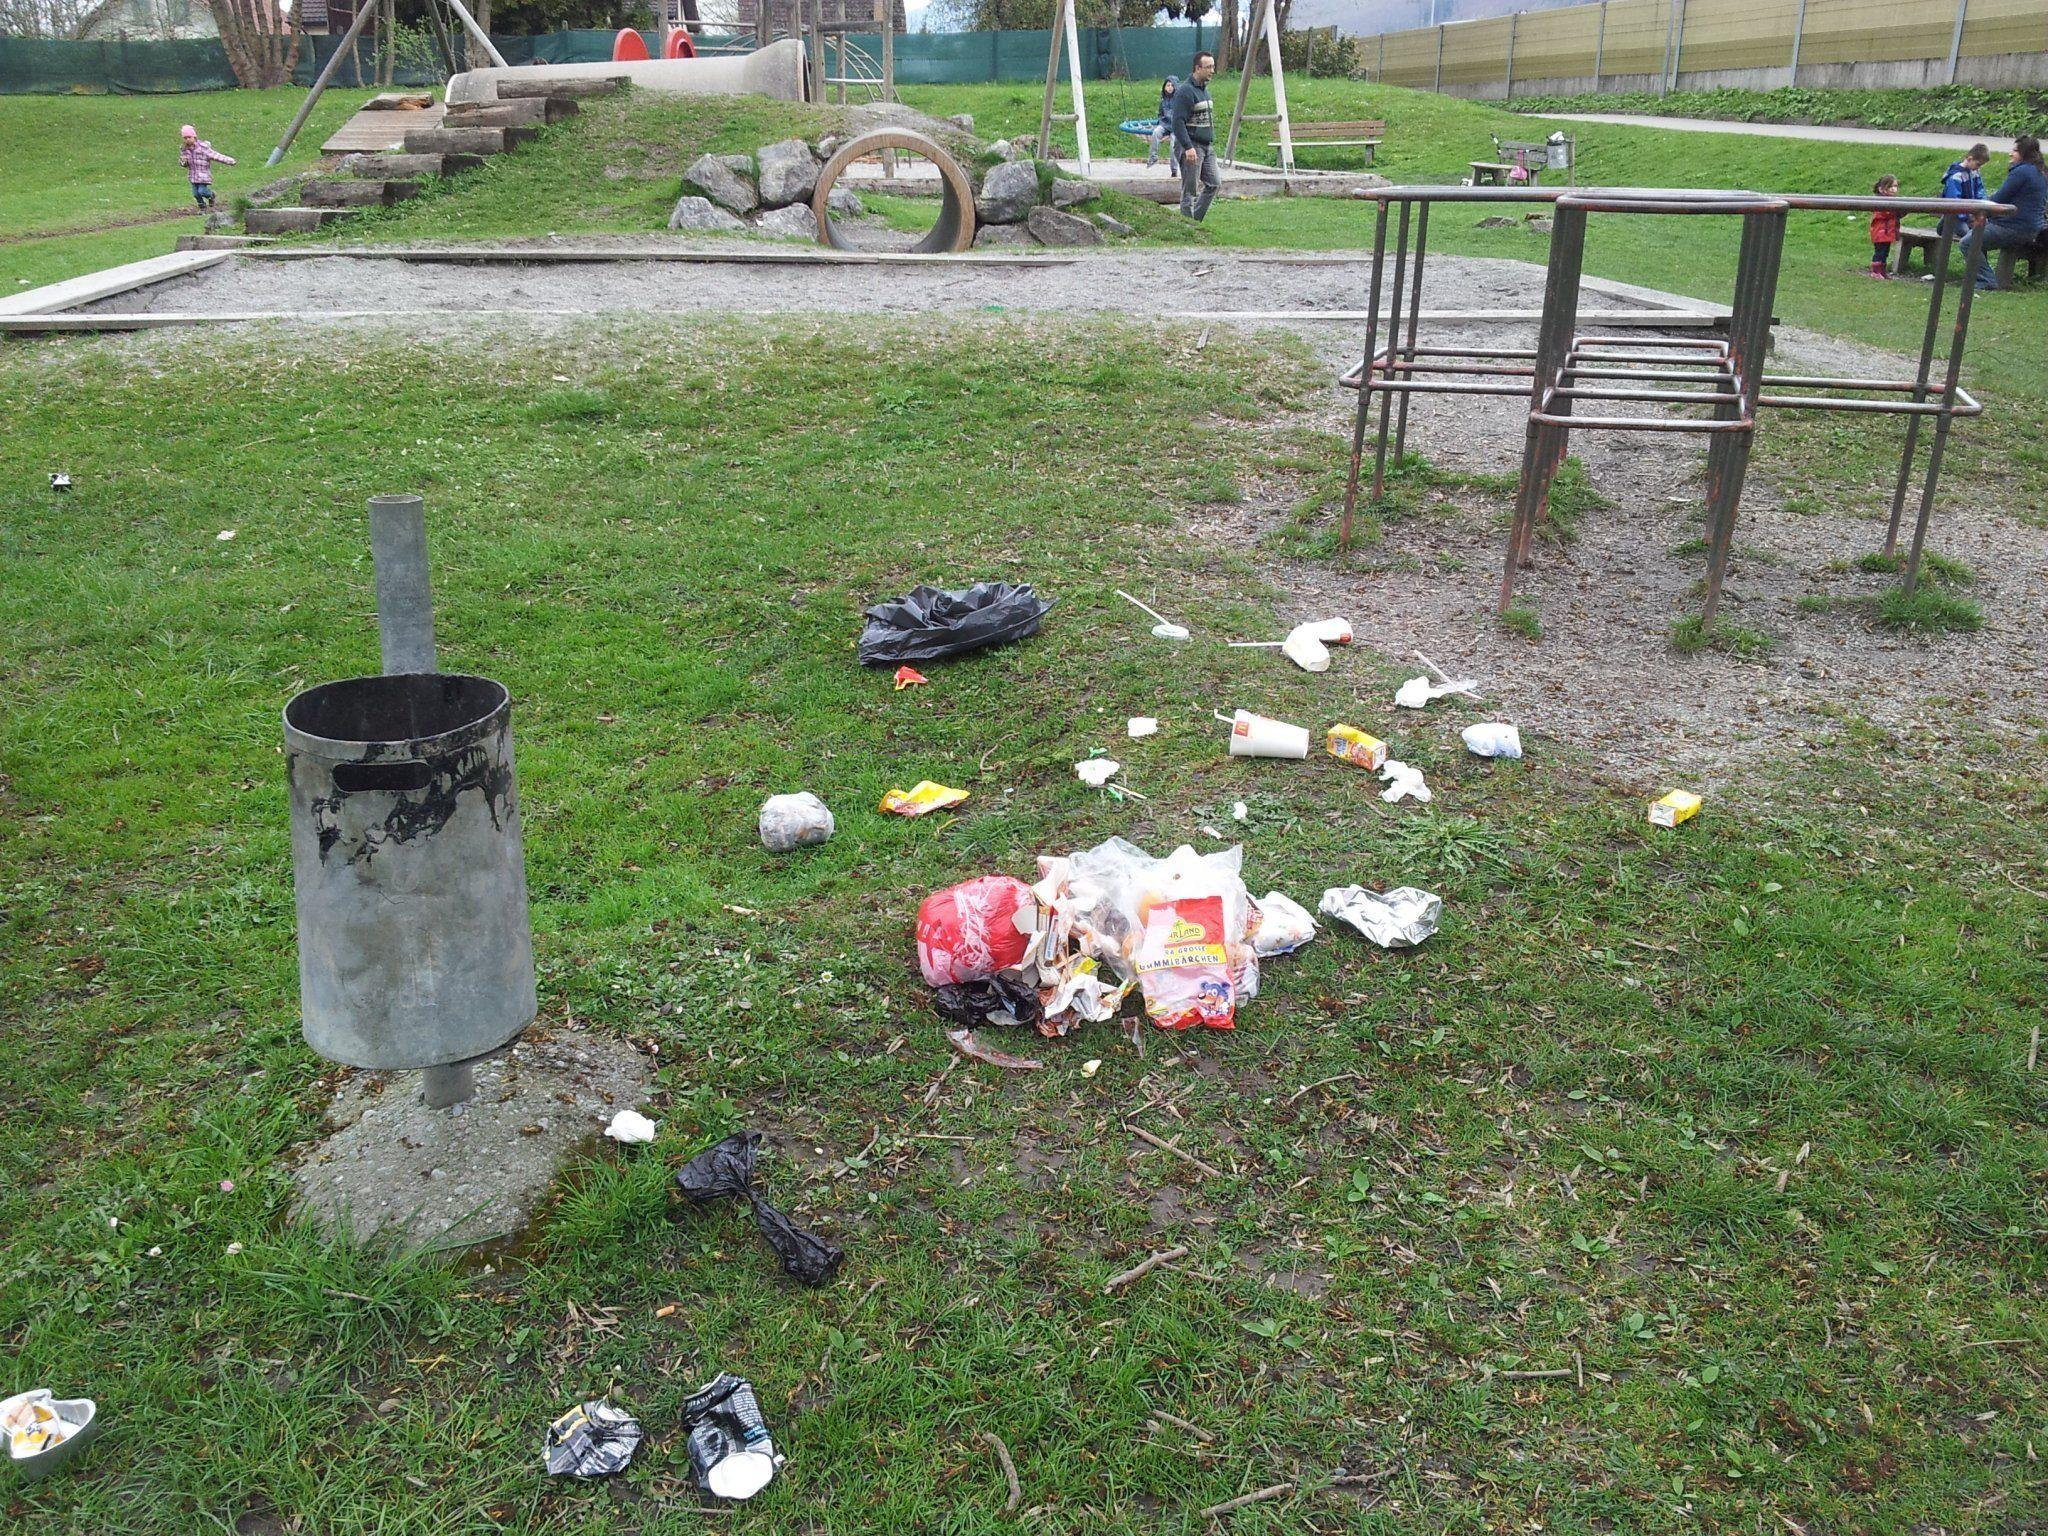 Müll am Rosenplatz in Hohenems